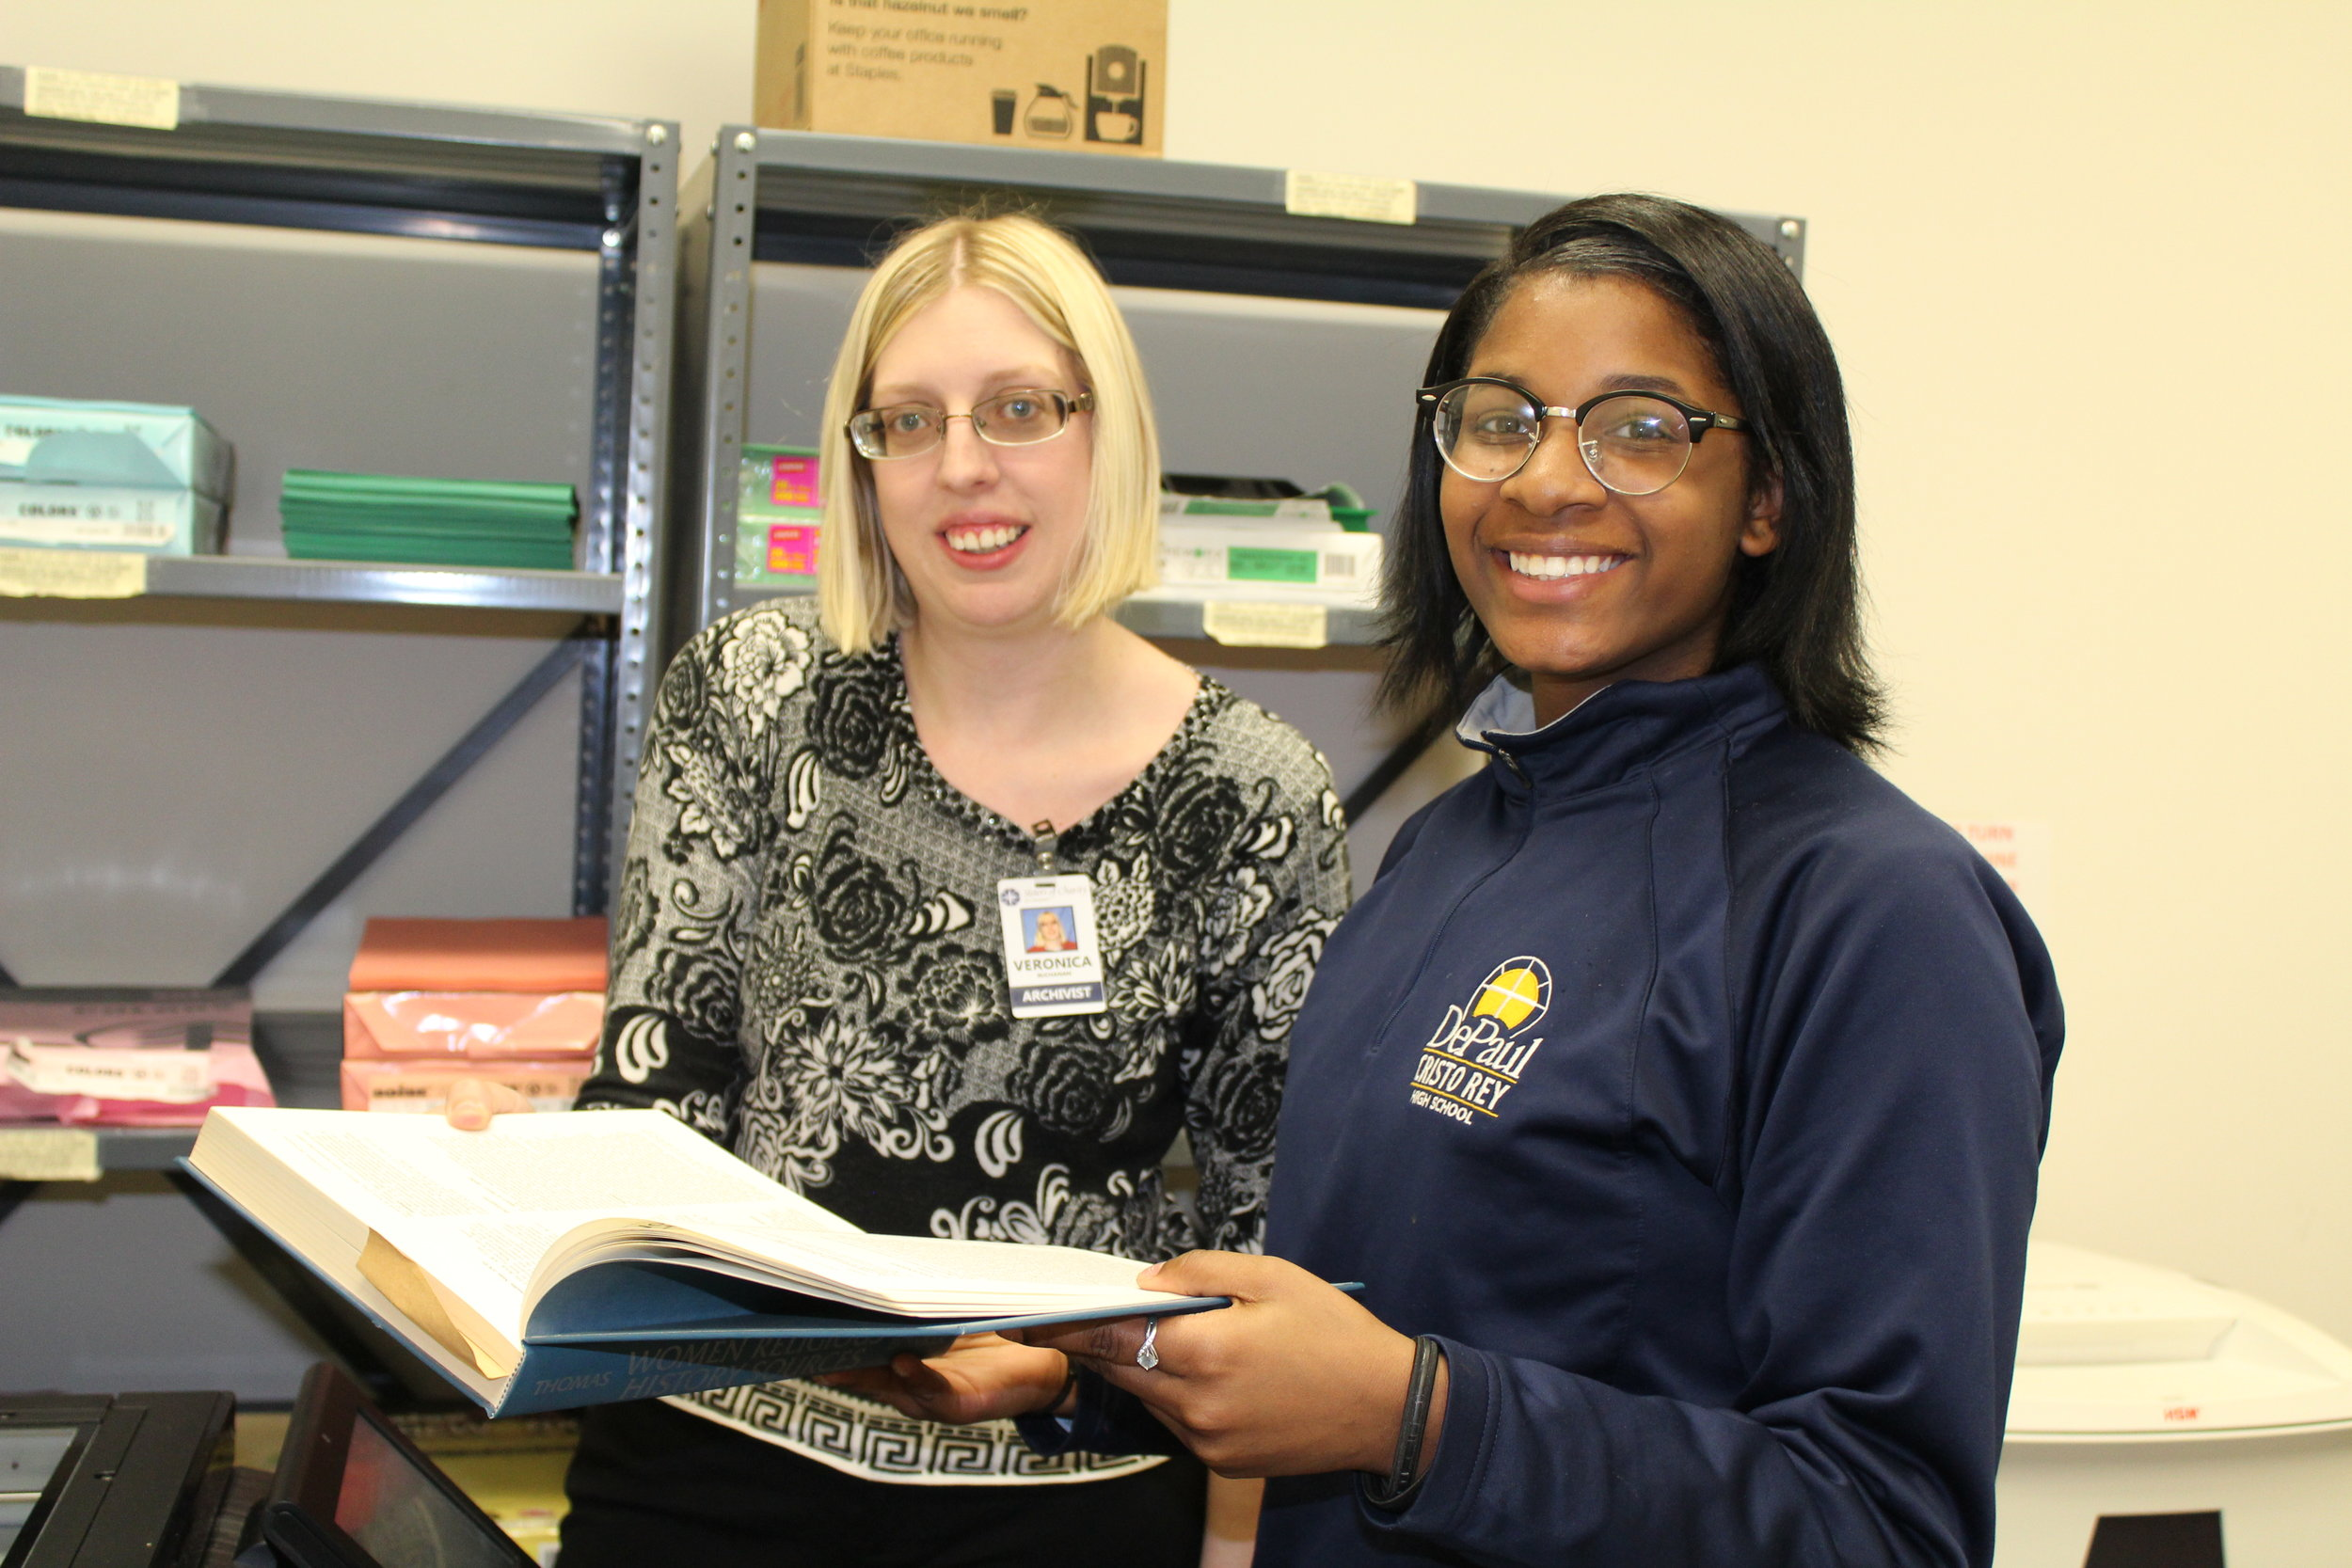 SC Archivist Veronica Buchanan and DePaul Freshman student Bre'Ale Jackson.